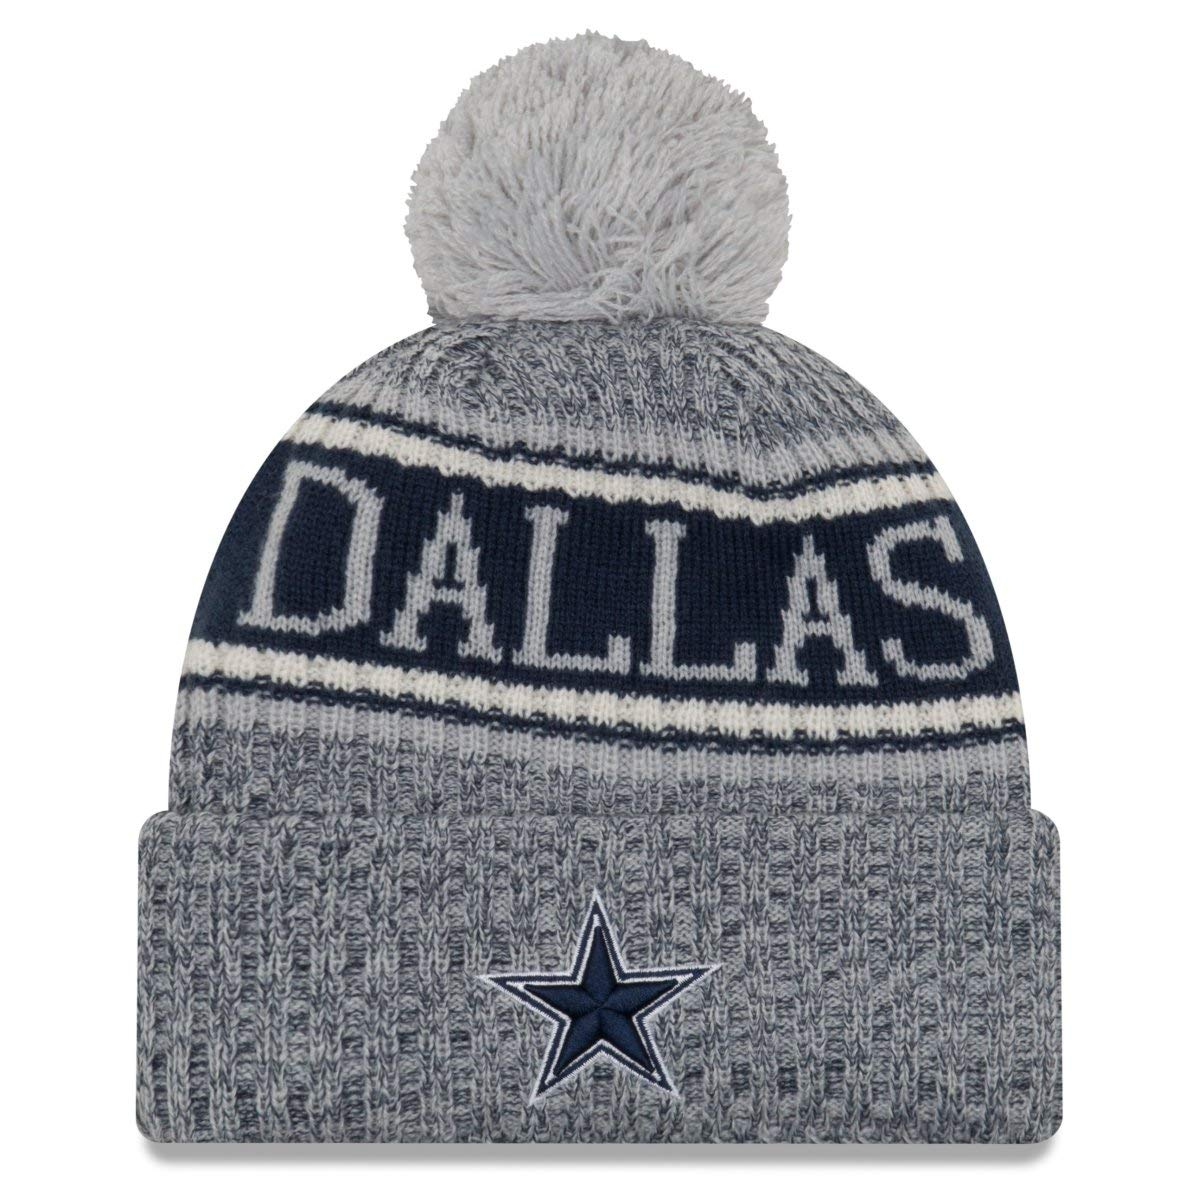 Dallas Cowboys 2018 Sport Knit Bobble Beanie Grau-Blau Farbe Grau-Blau New Era